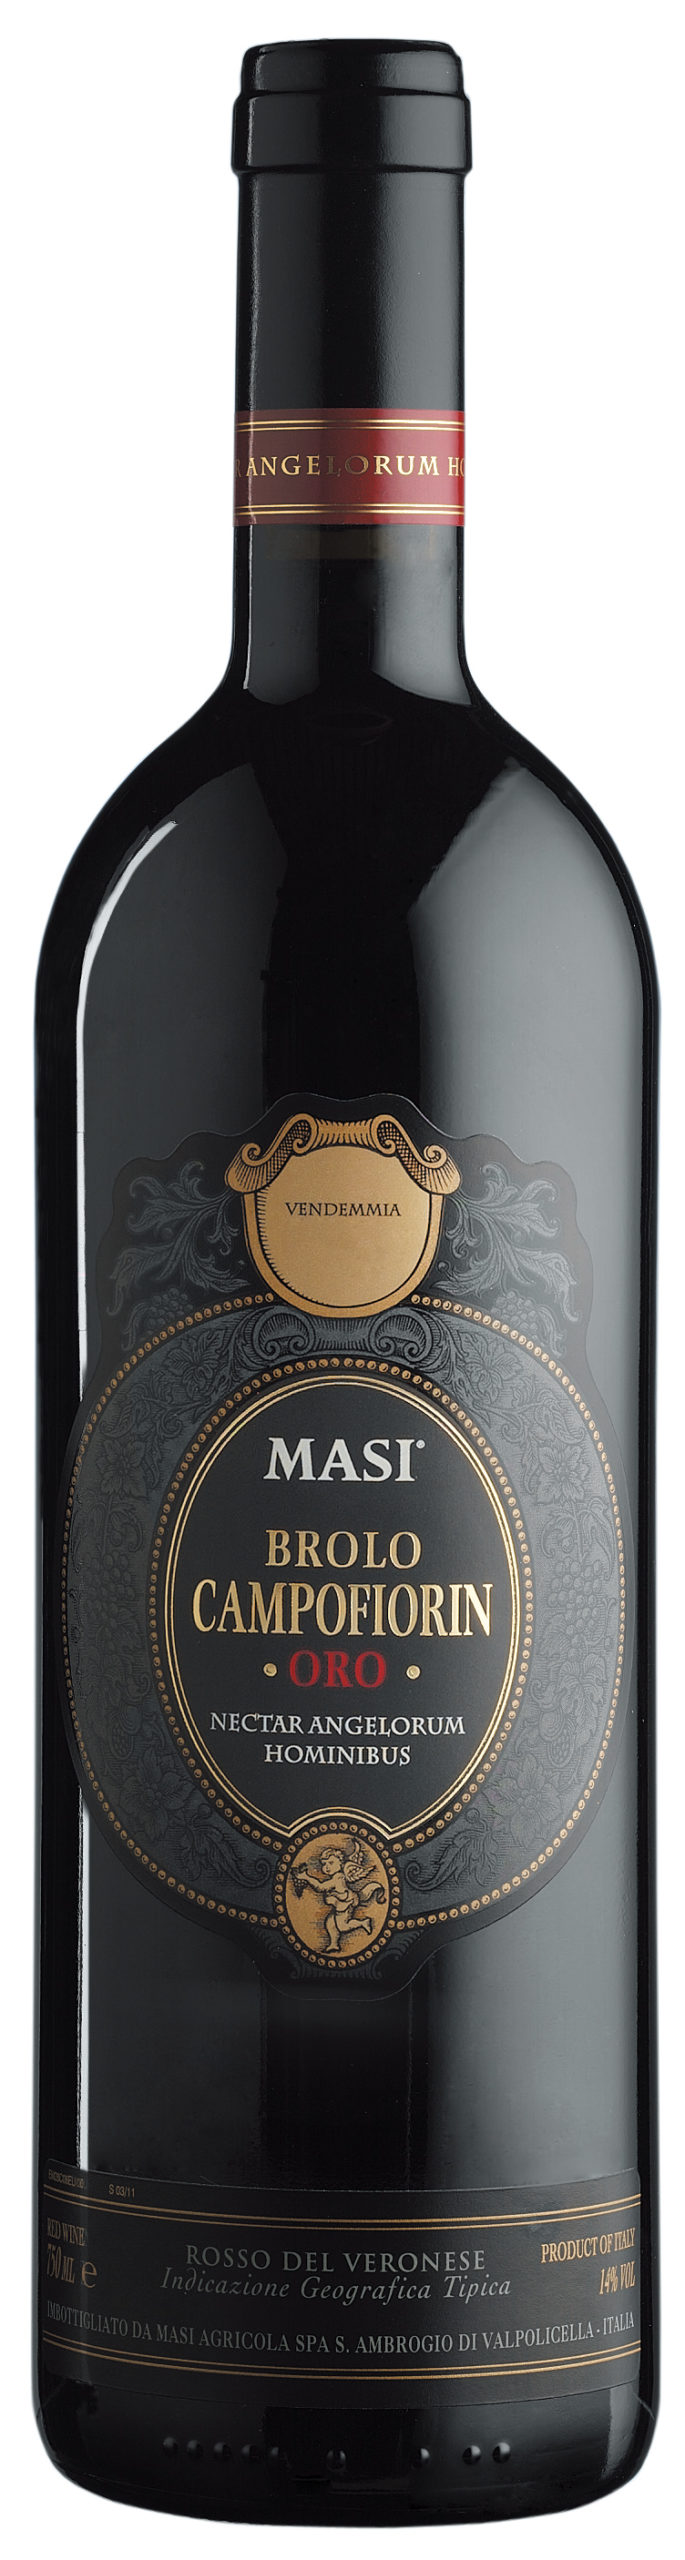 Brolo Campofiorin Oro(1500ml) ブローロ・カンポフィオリン・オロ(1500ml)